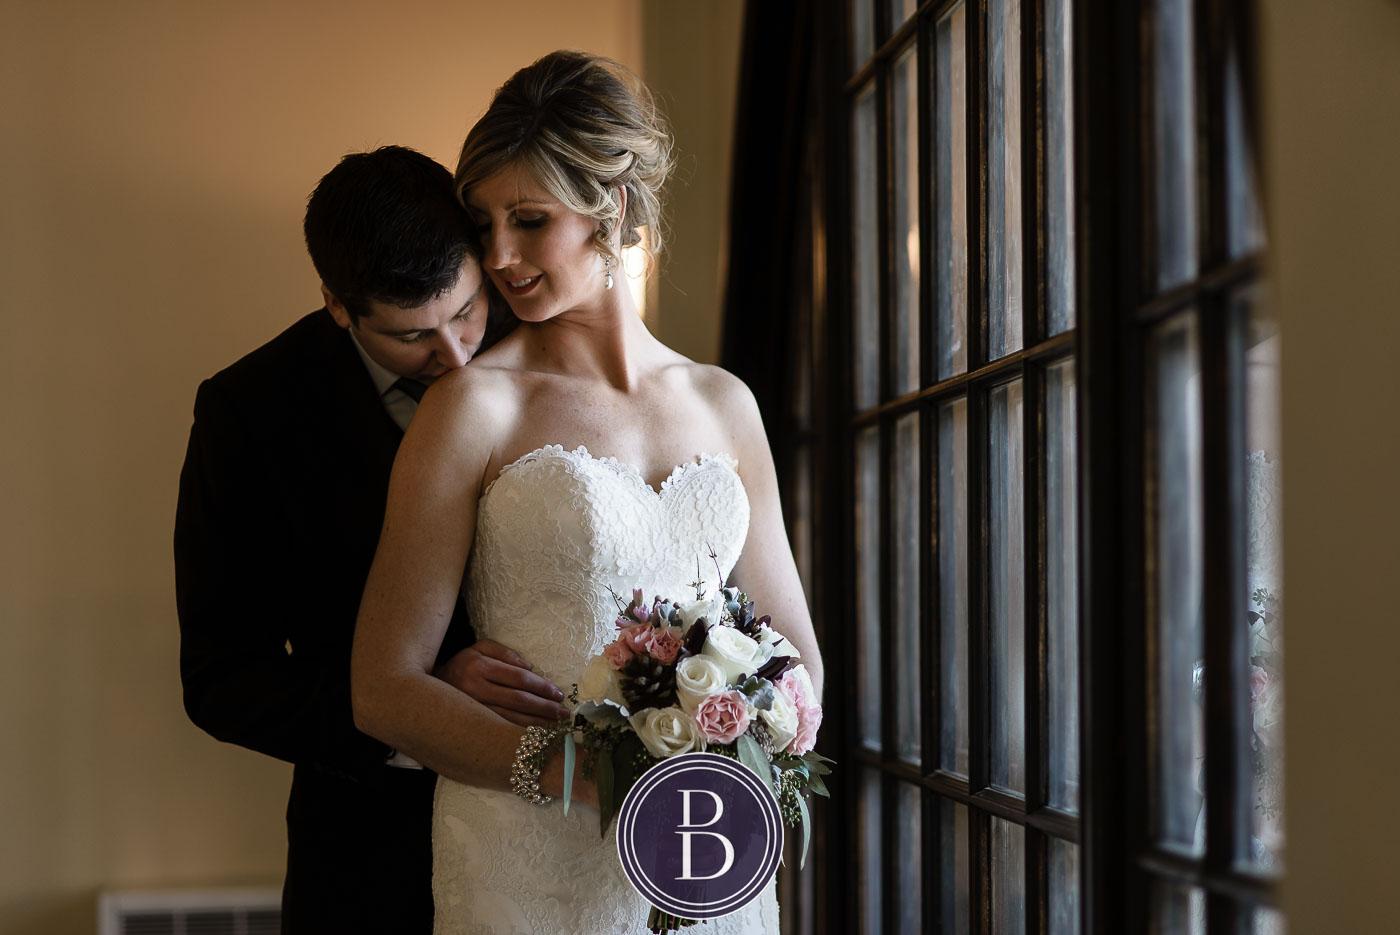 Romantic portrait in the moment bride groom Hamilton building